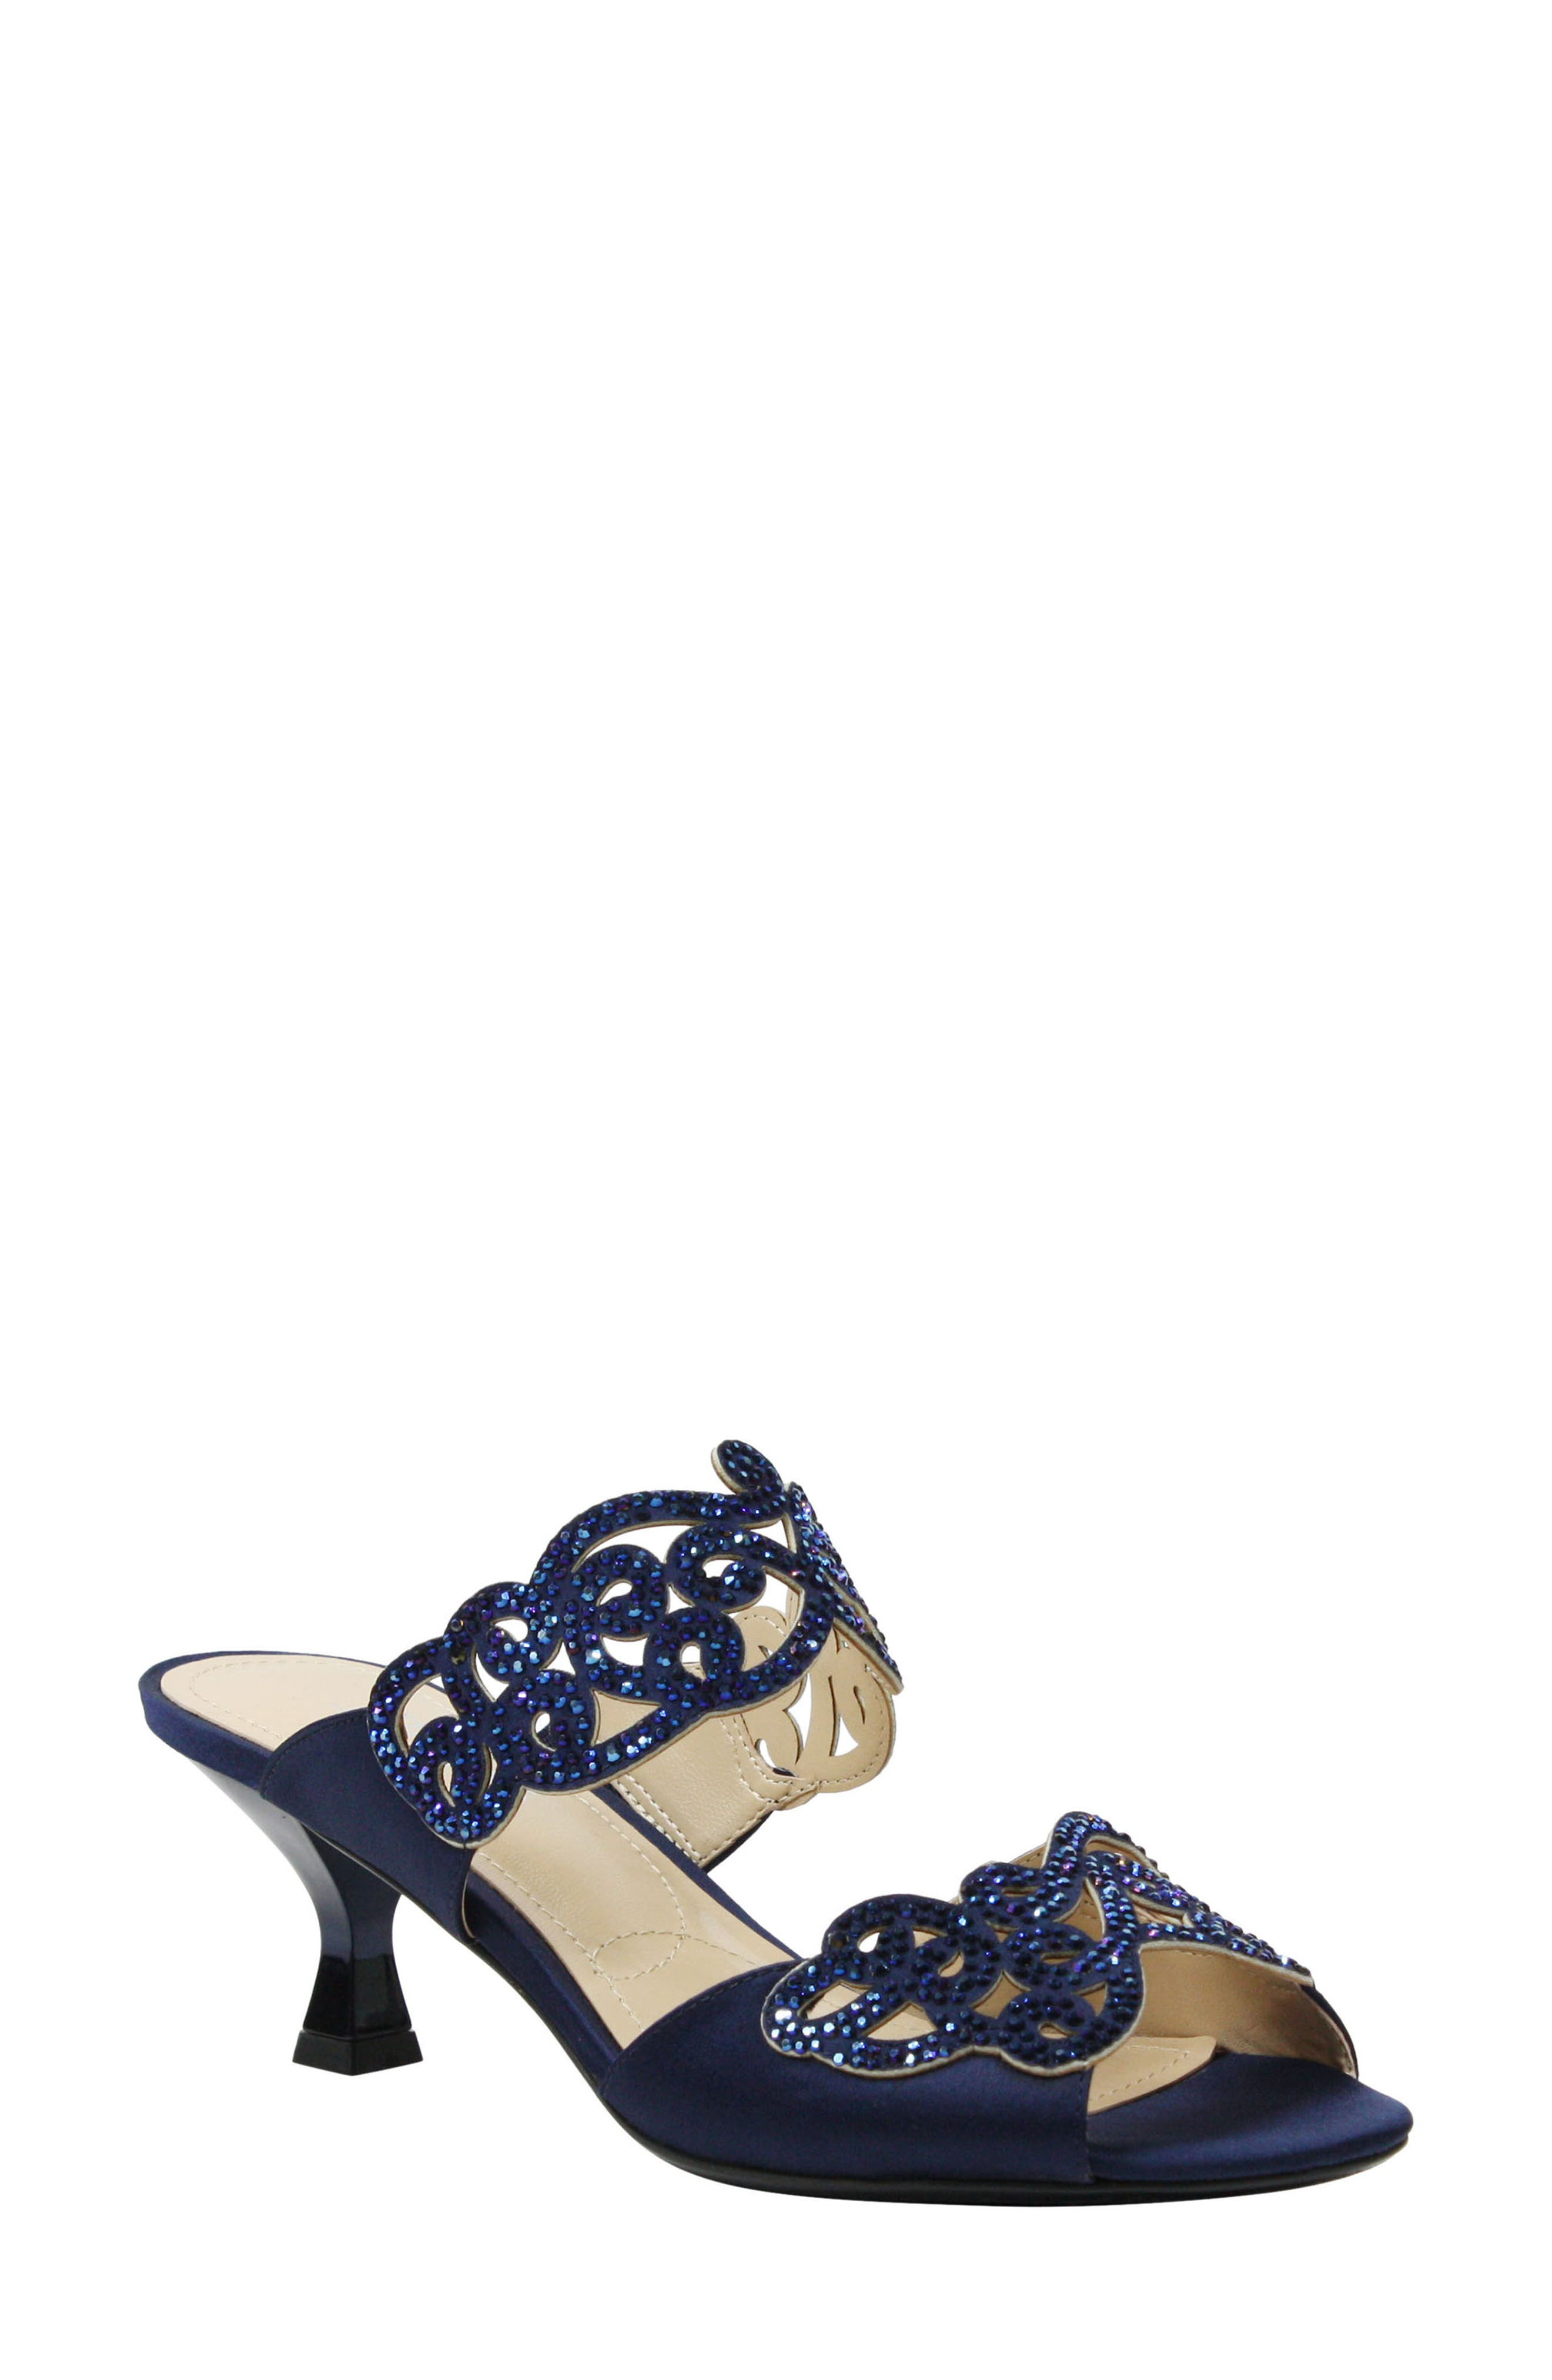 J. RENEÉ 'Francie' Evening Sandal, Main, color, NAVY FABRIC